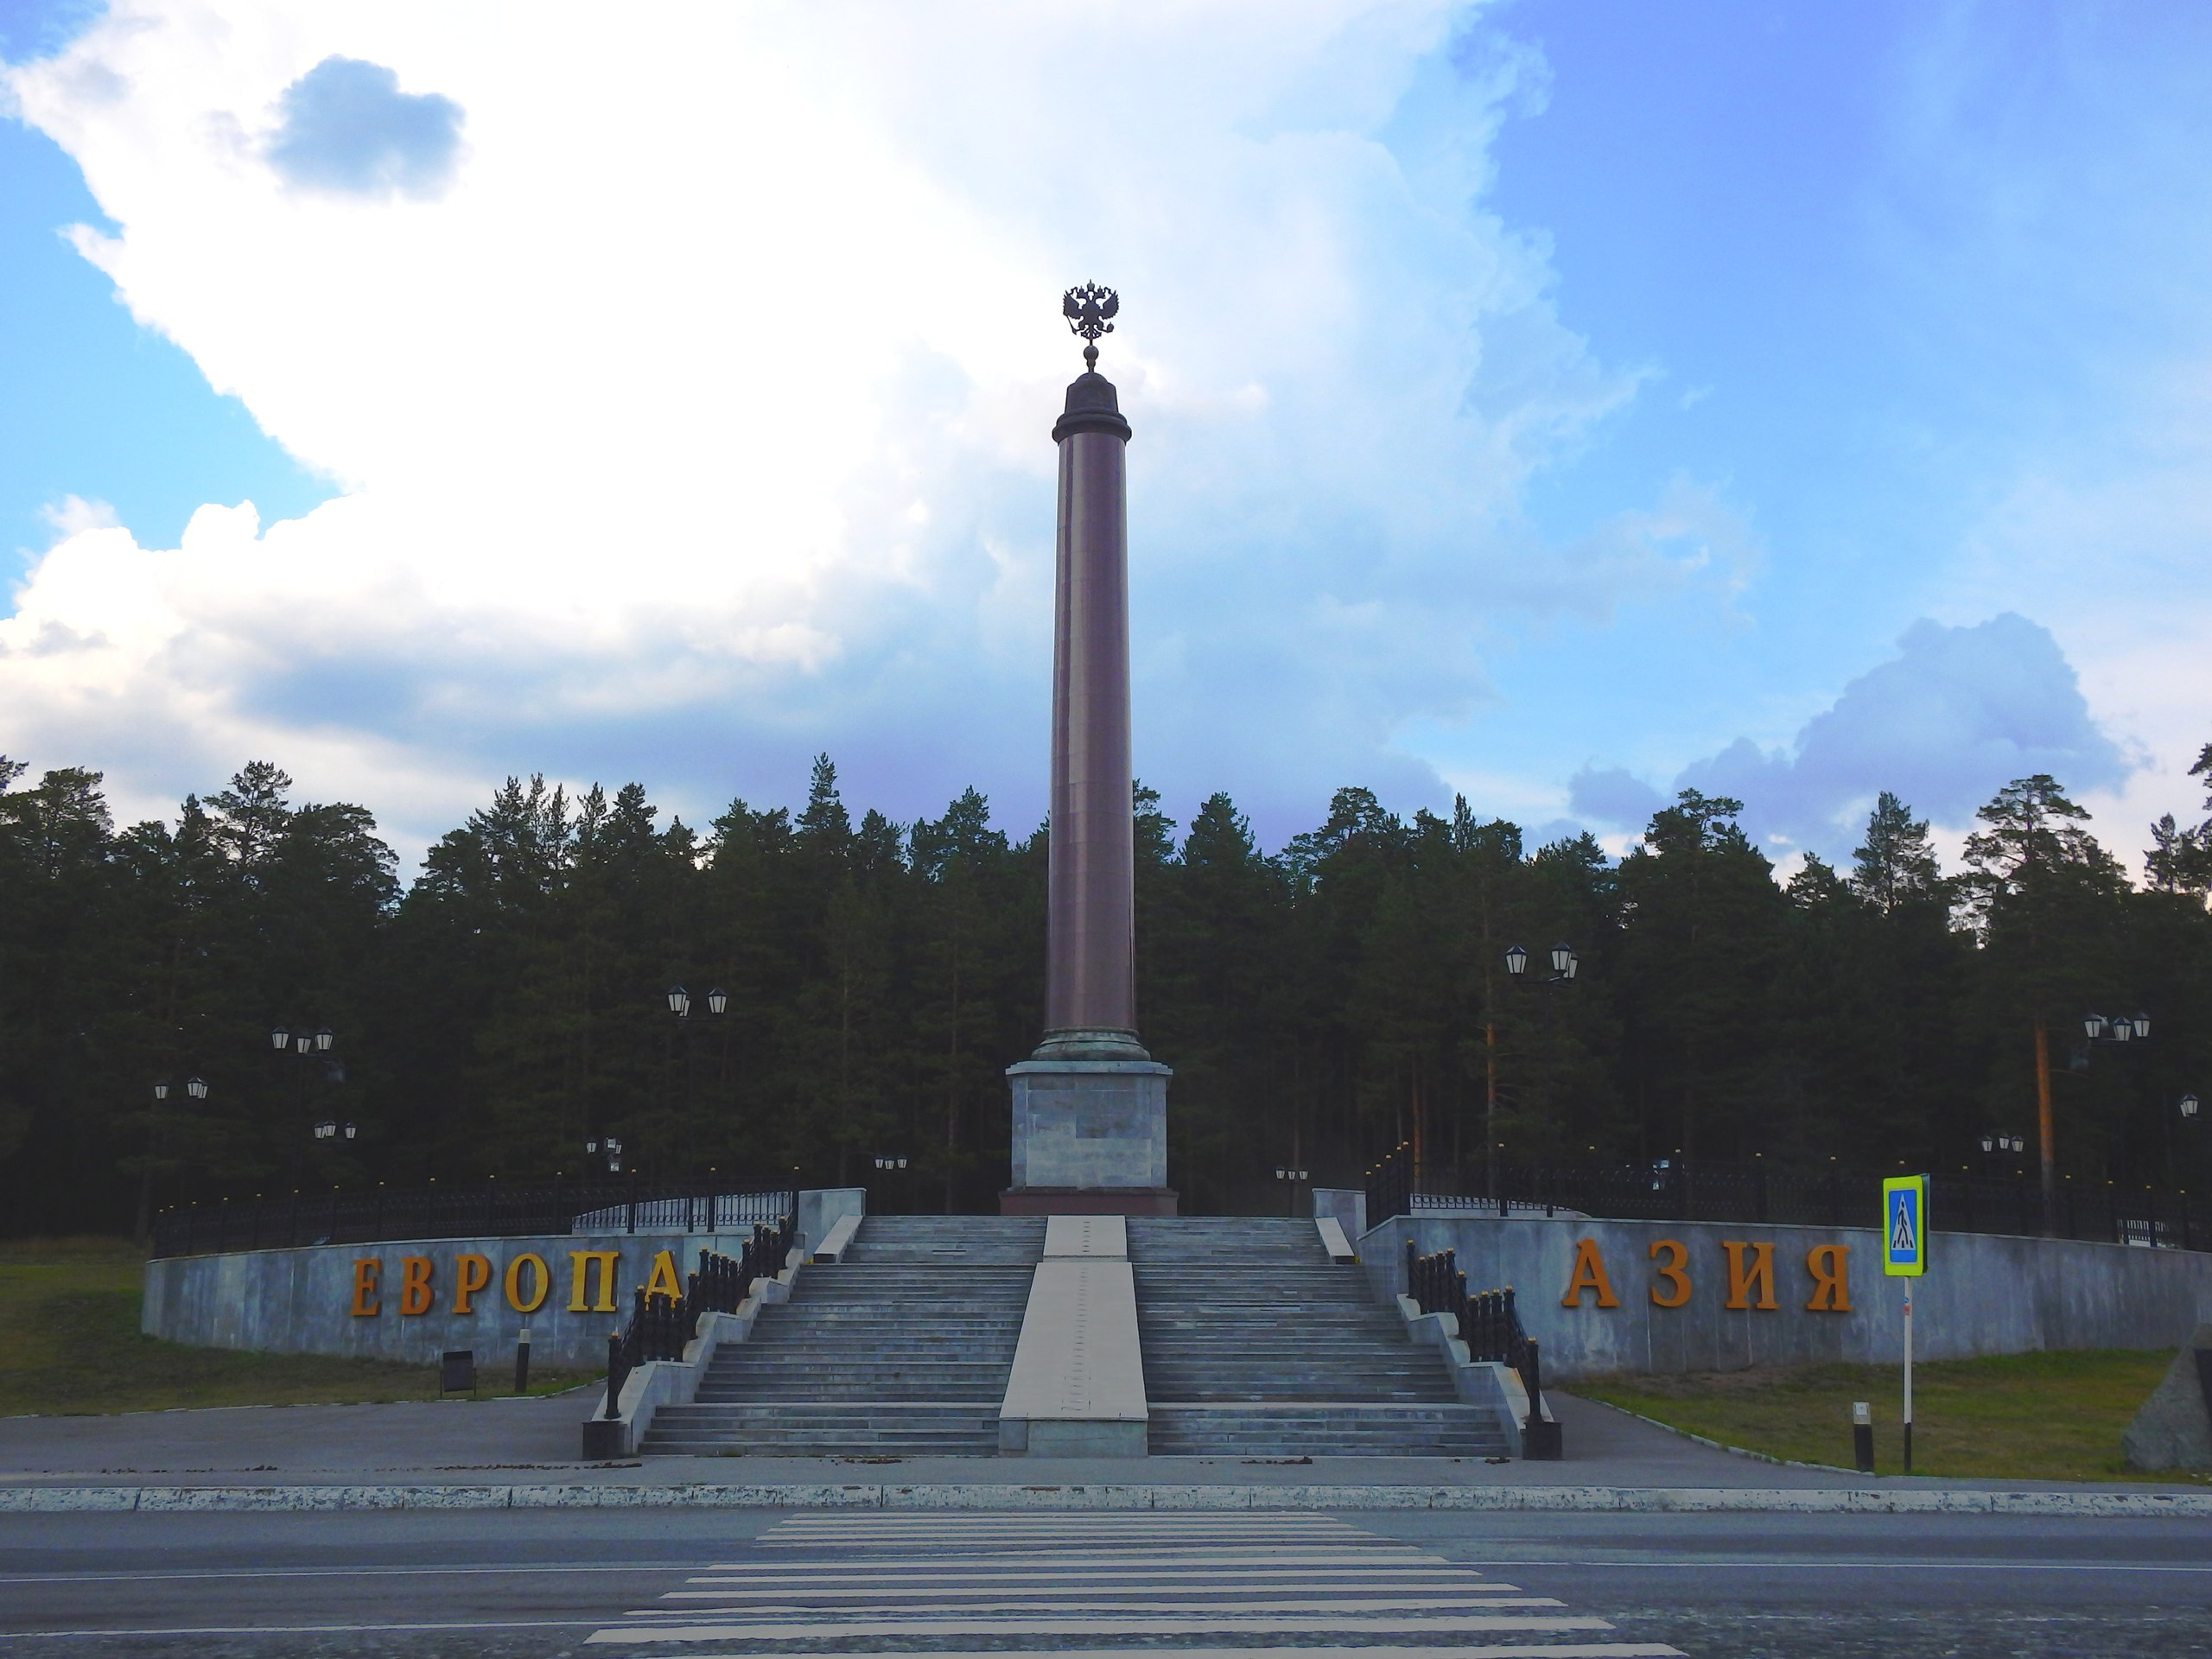 Фото европа азия екатеринбург